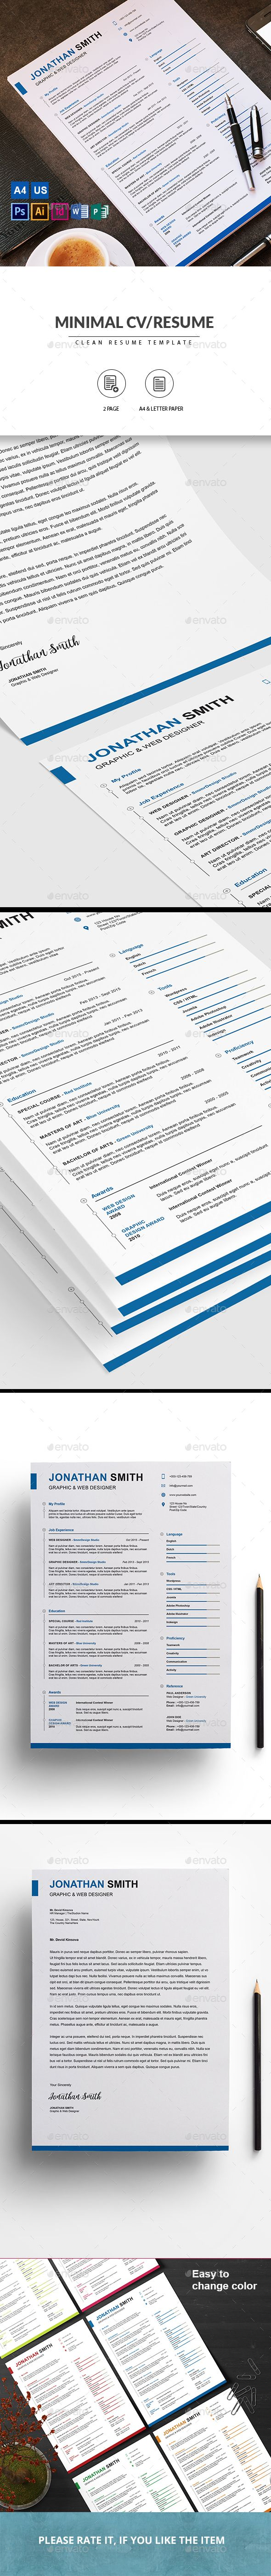 Resume Resume TipsResume CvResume FormatResume 1103